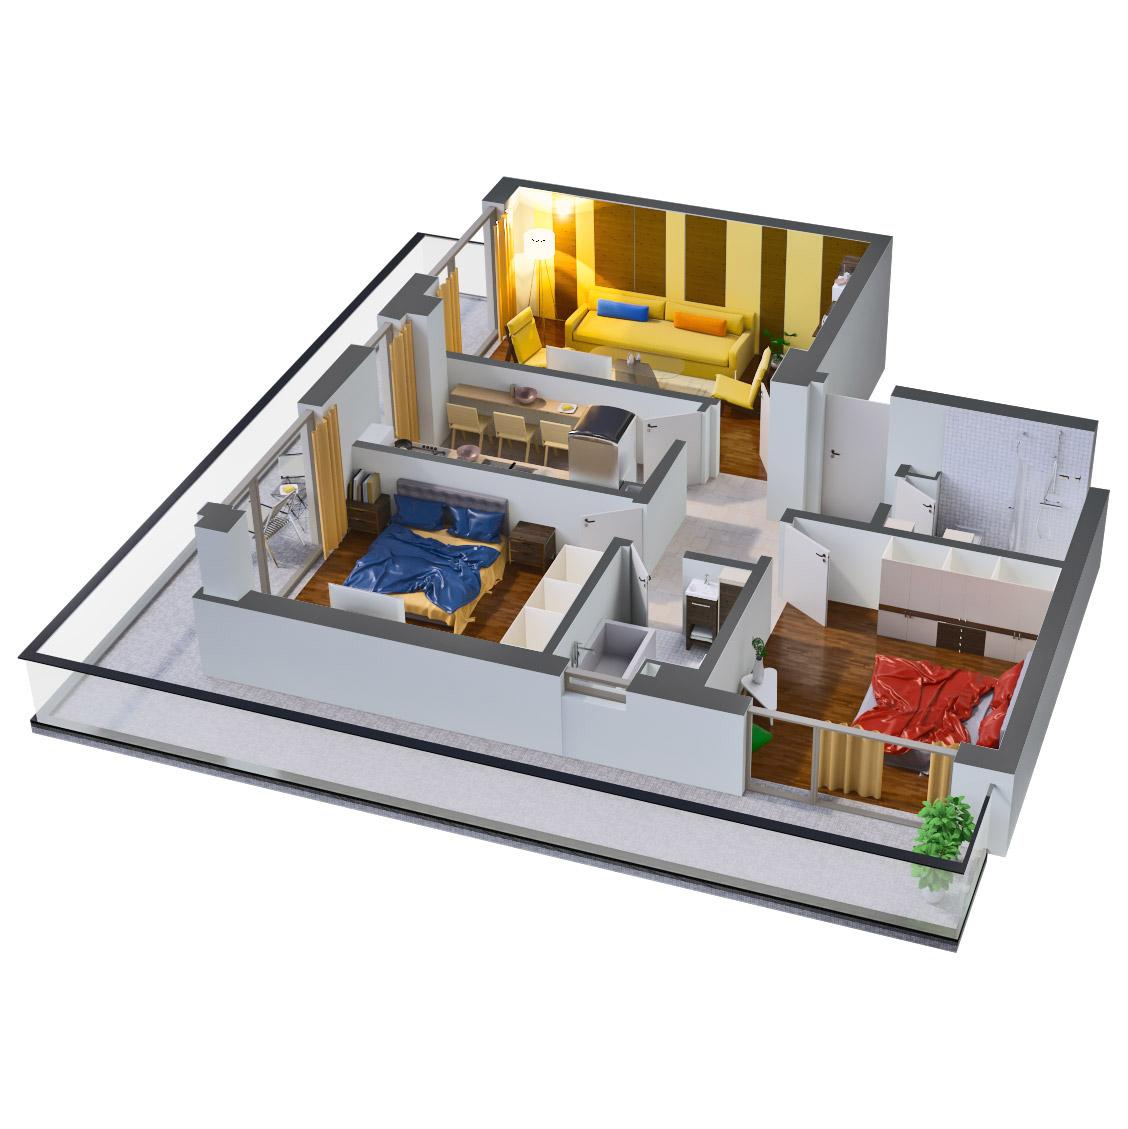 Apartament 3 camere de vanzare Bucuresti - Catedral Residence - Marriott, Piata Unirii, 13 Septembrie, Izvor - Tip 6 - T2A - B